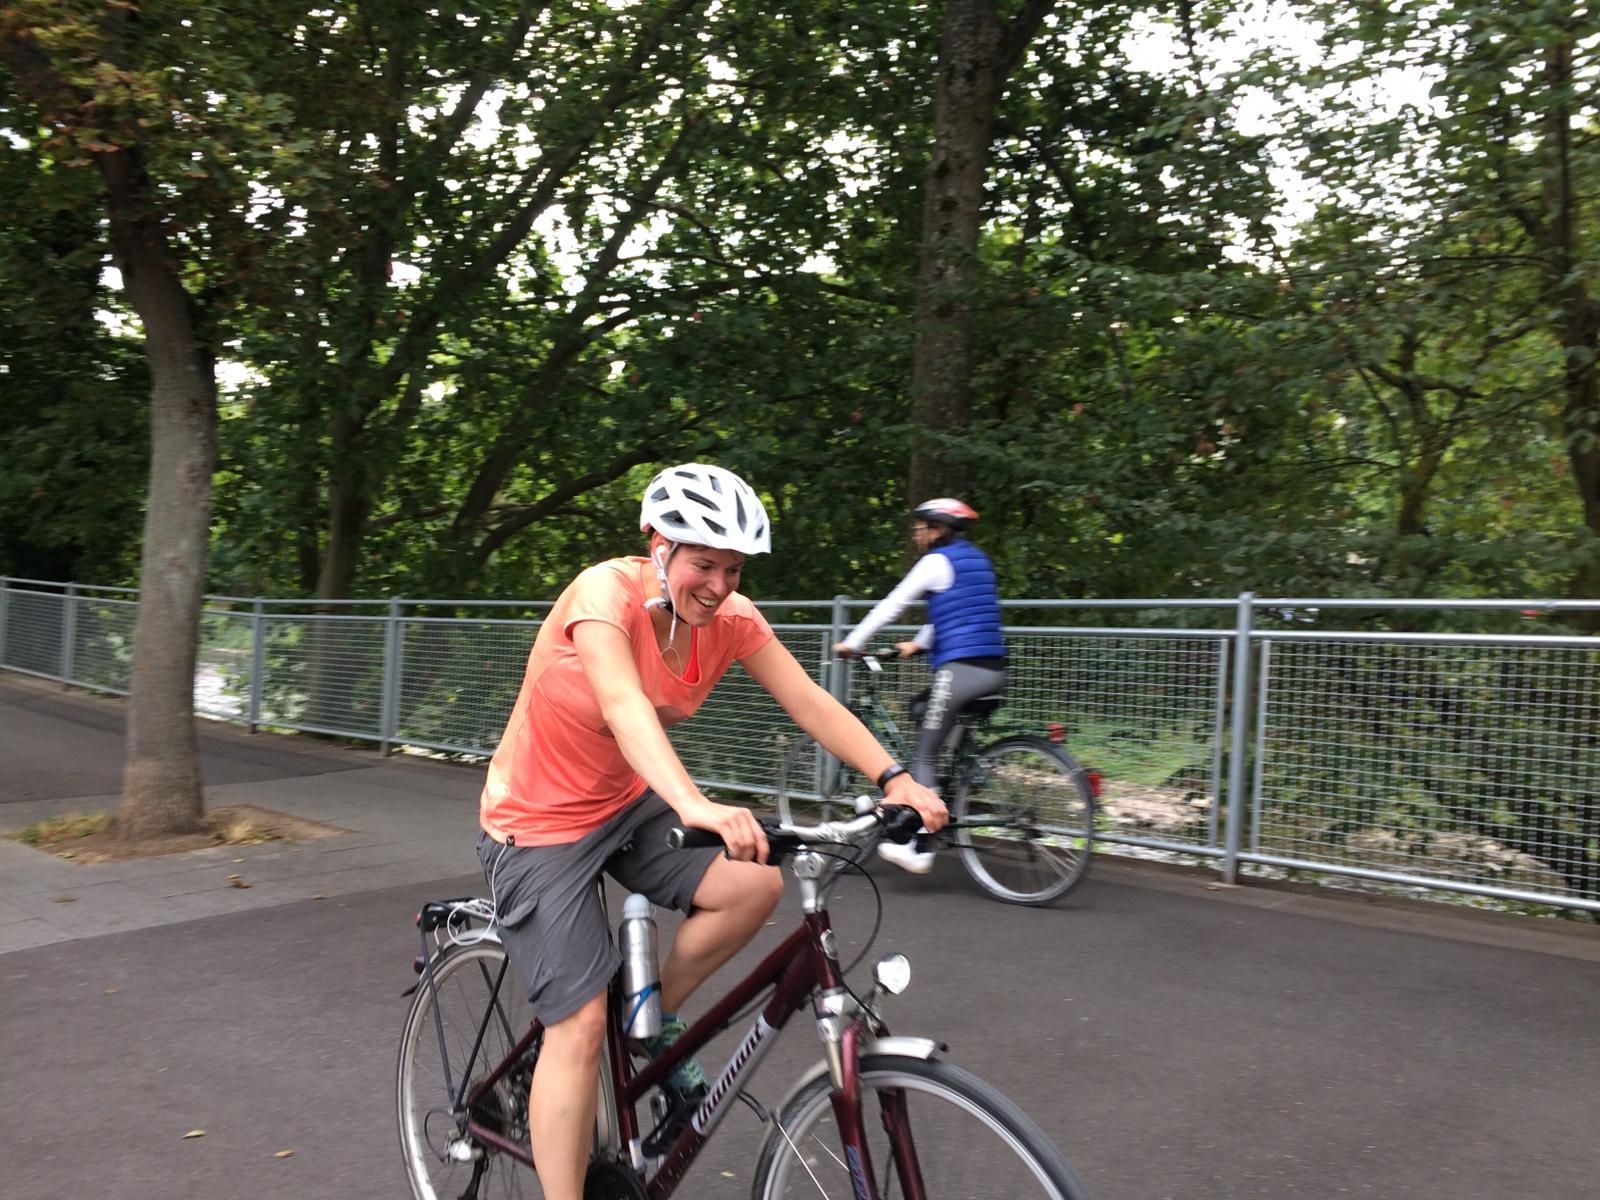 KiKu still goes olympia - Fahrrad fahren